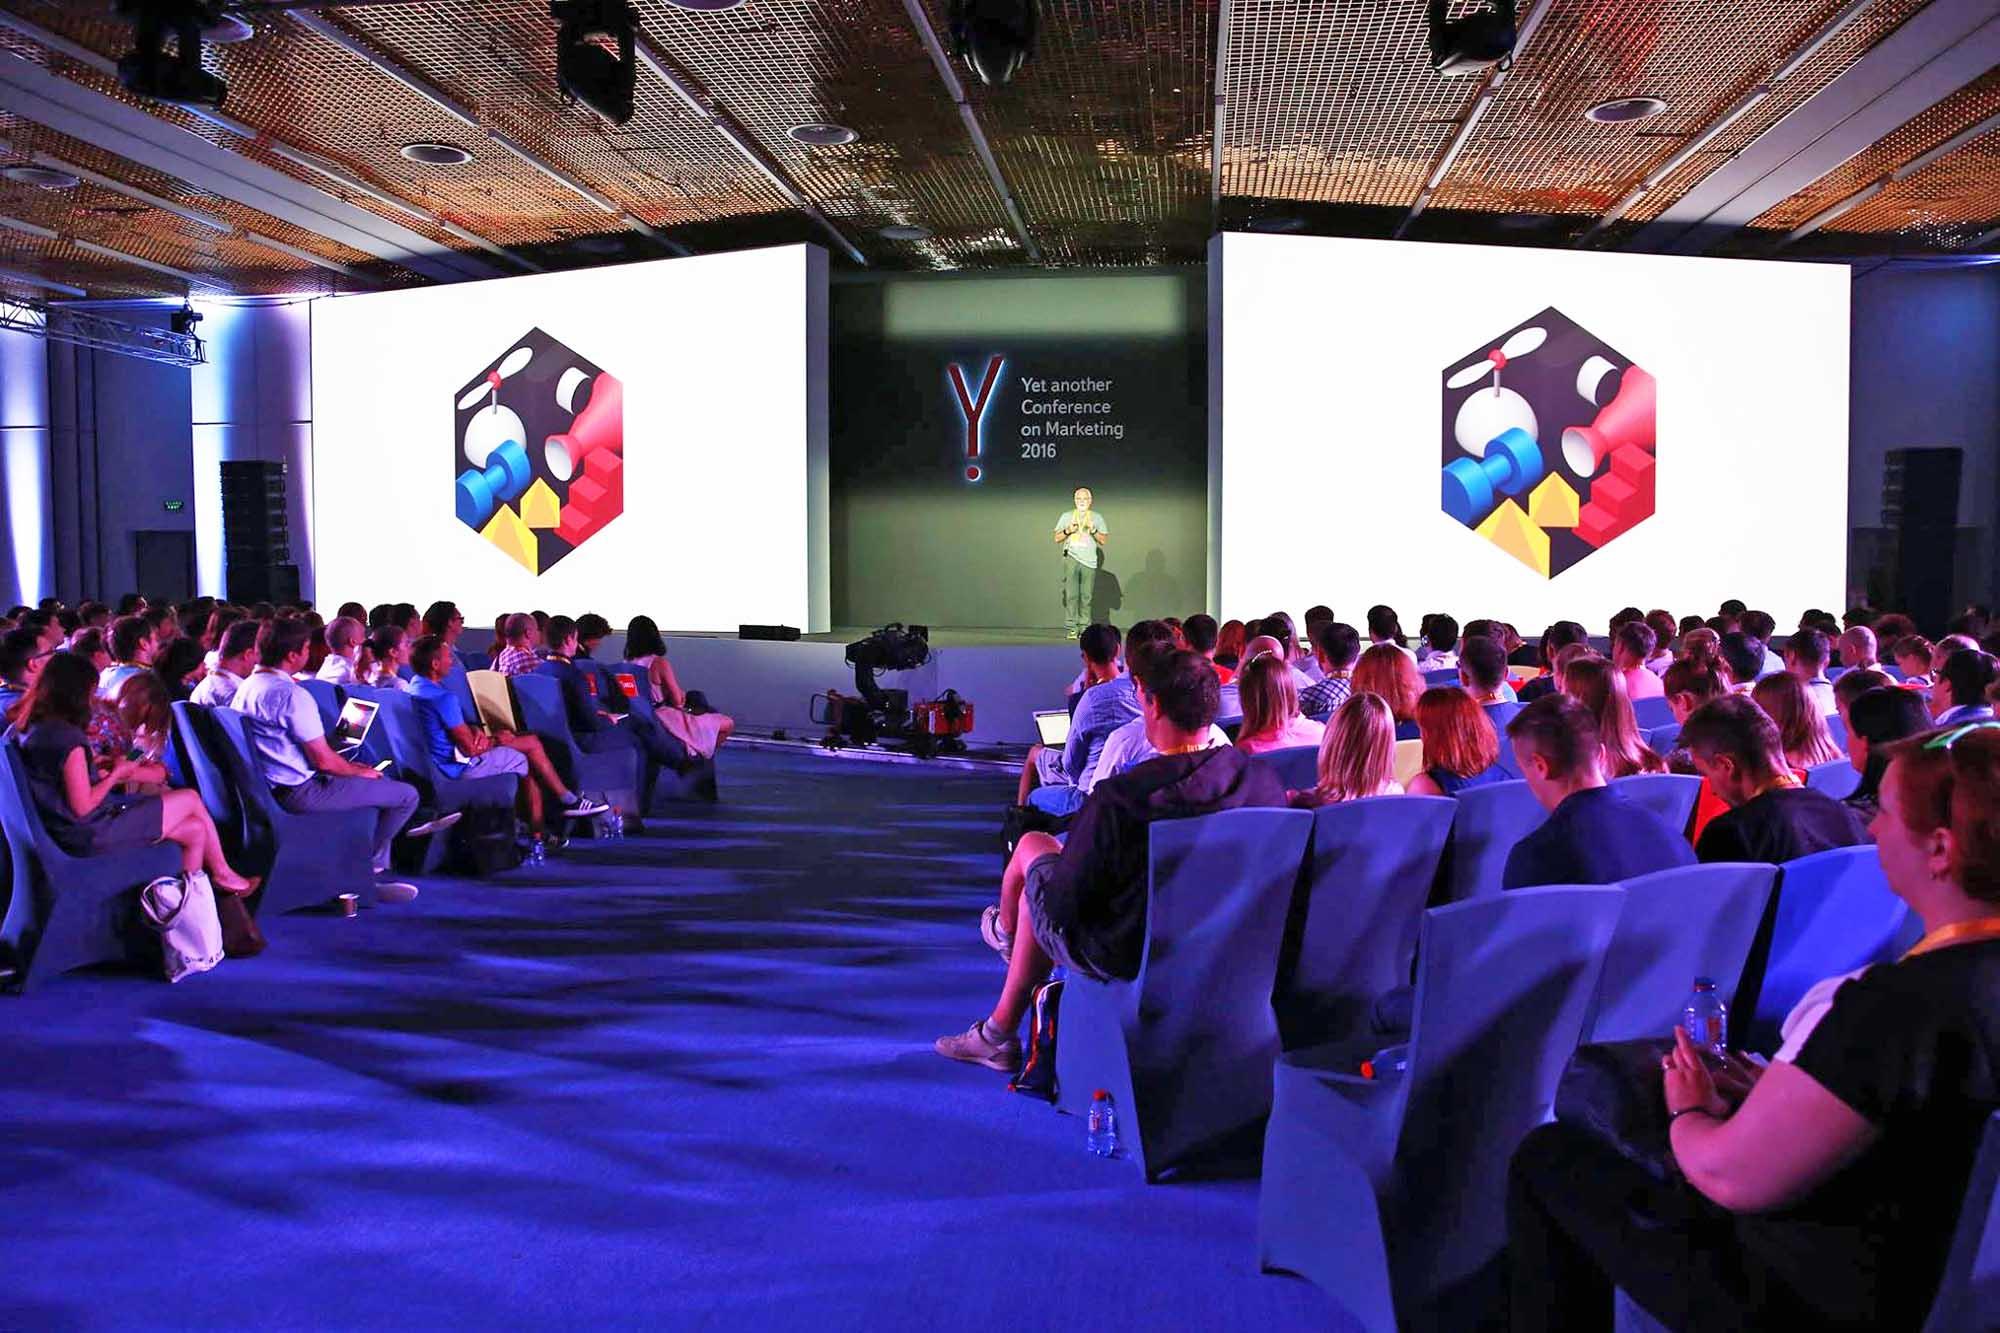 События  Трансляция конференции Яндекса YaC 2017 на morsmagazine.ru